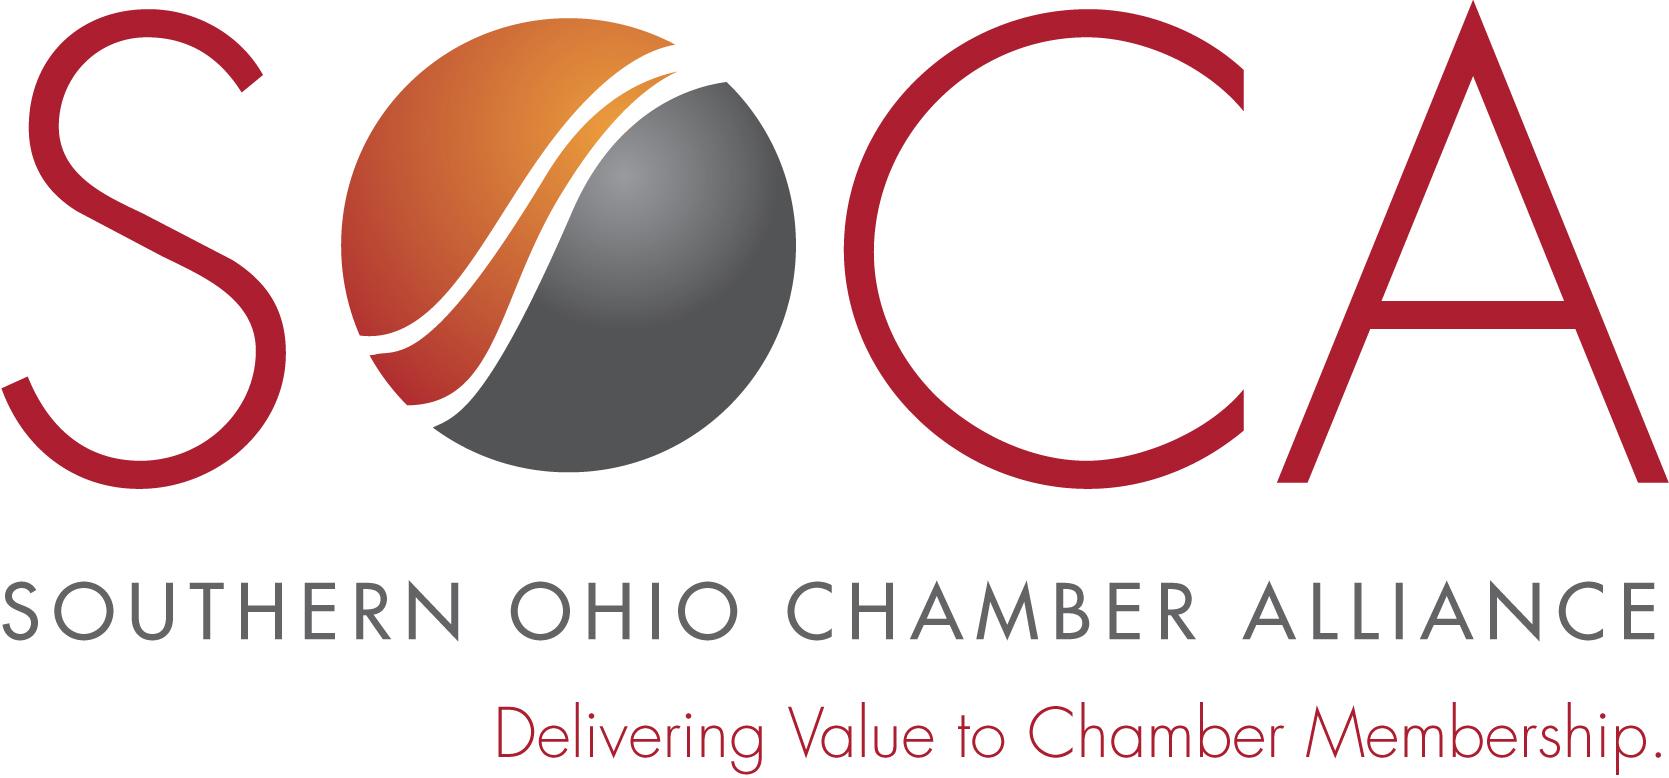 Southern Ohio Chamber Alliance logo